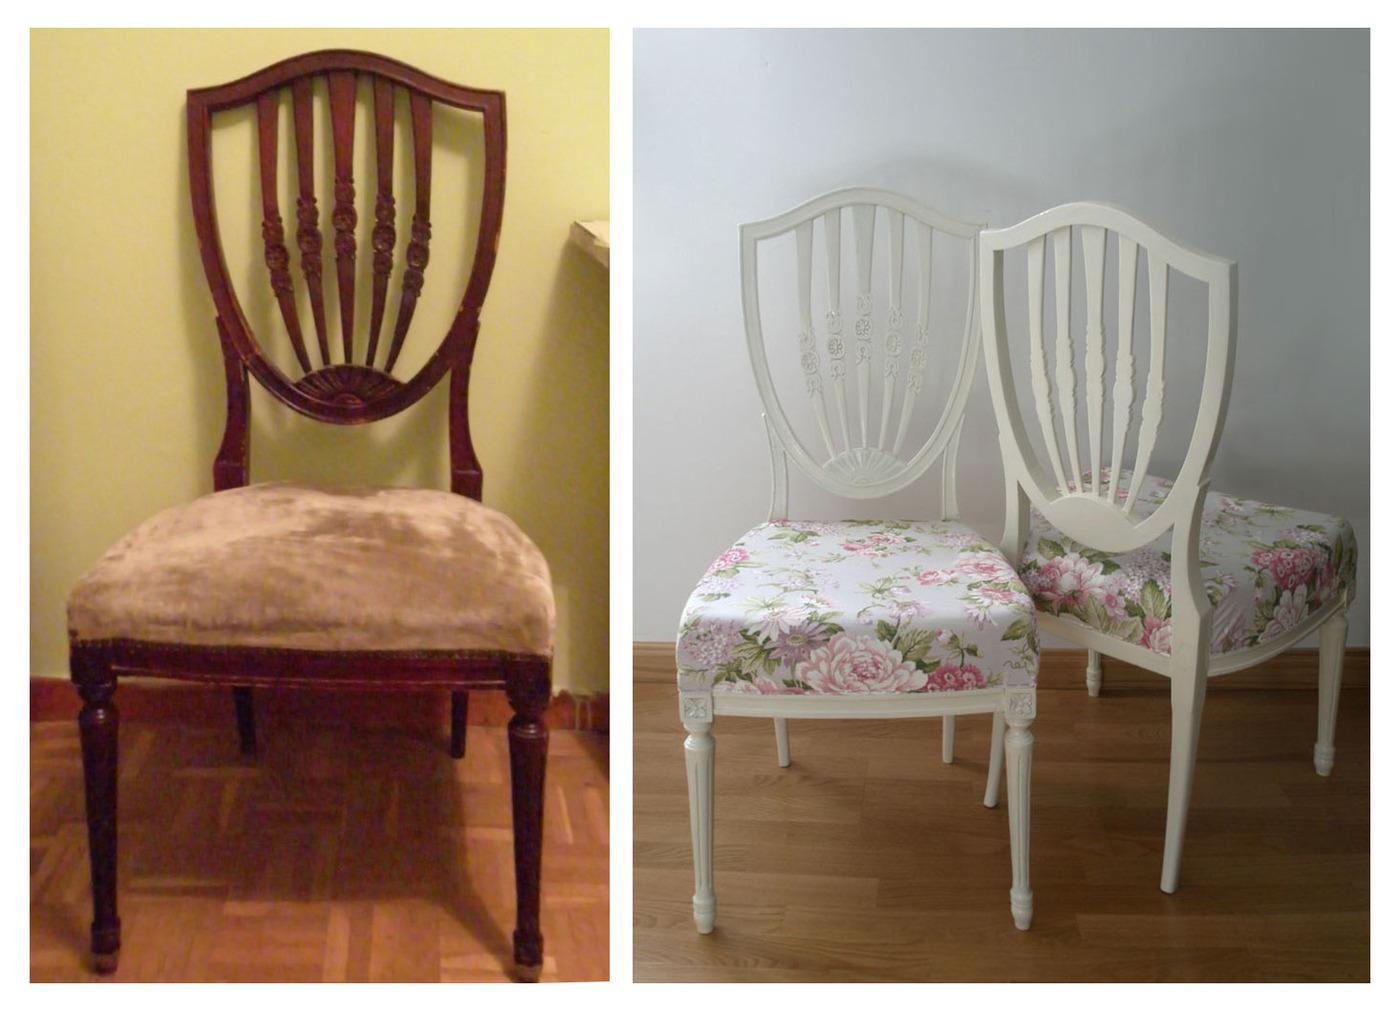 Transformaci n y recuperaci n sillas dise o polivalente - Sillas antiguas restauradas ...